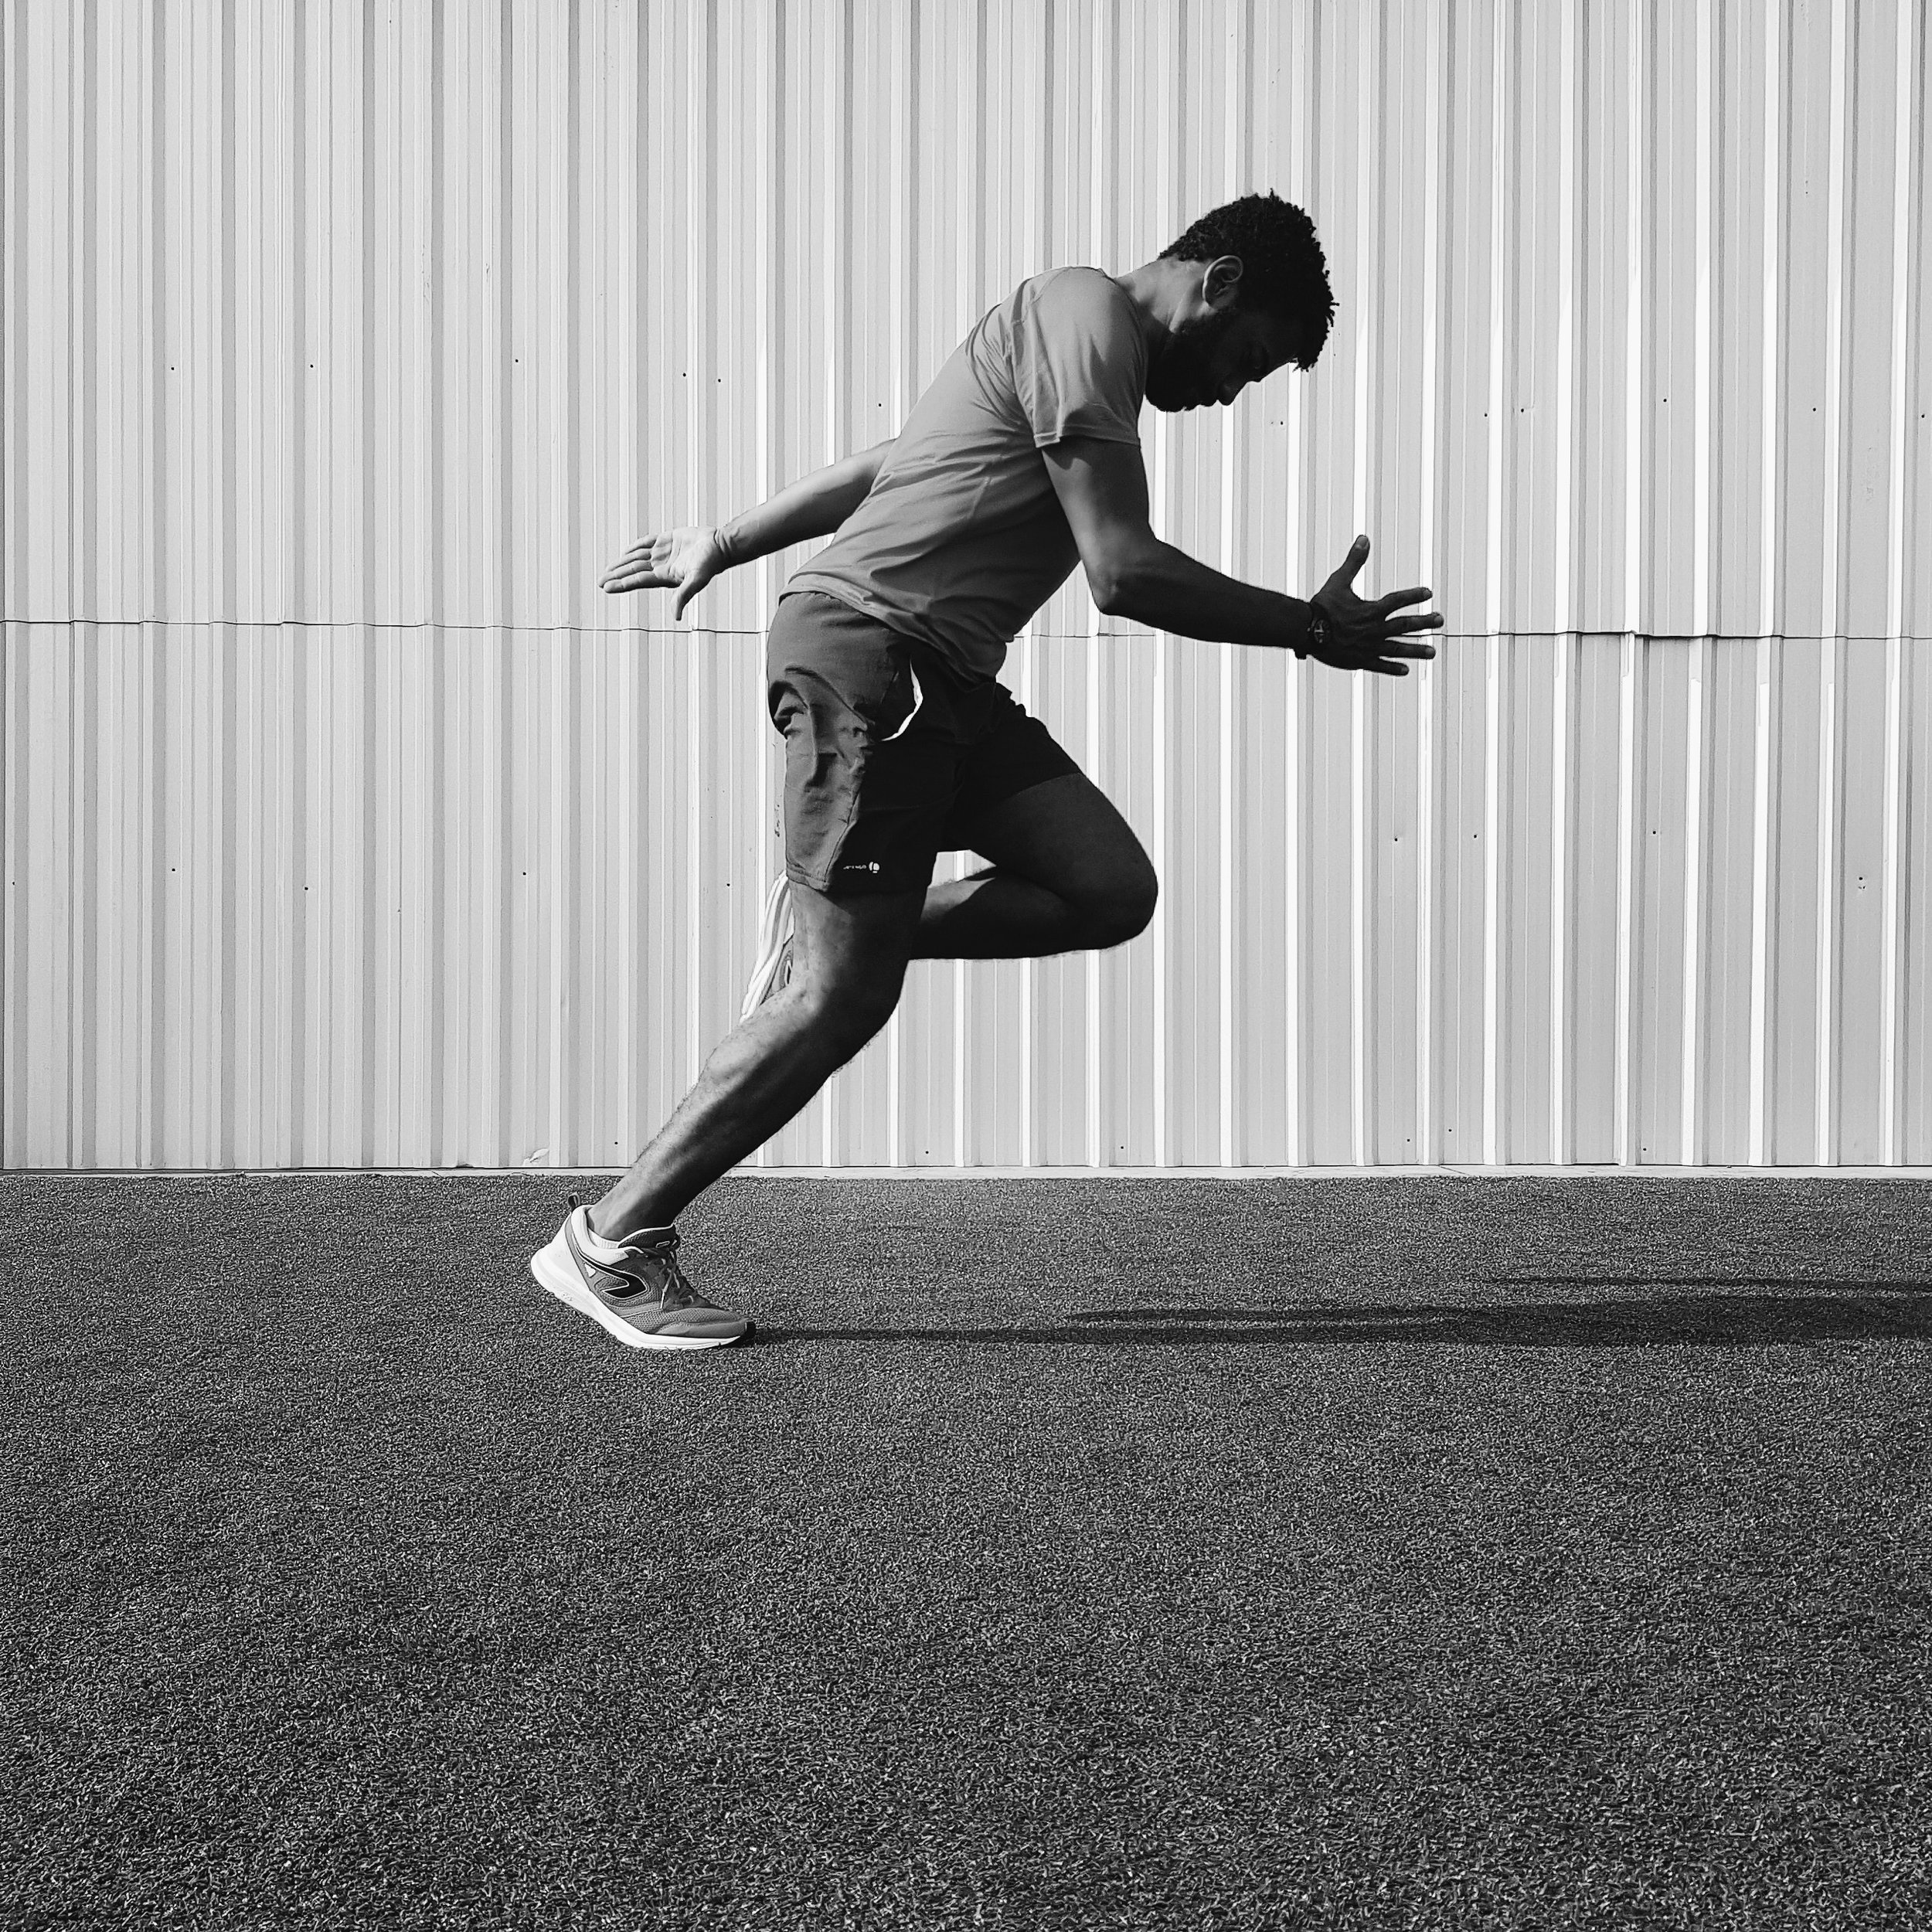 action-athlete-athletic-1813776.jpg